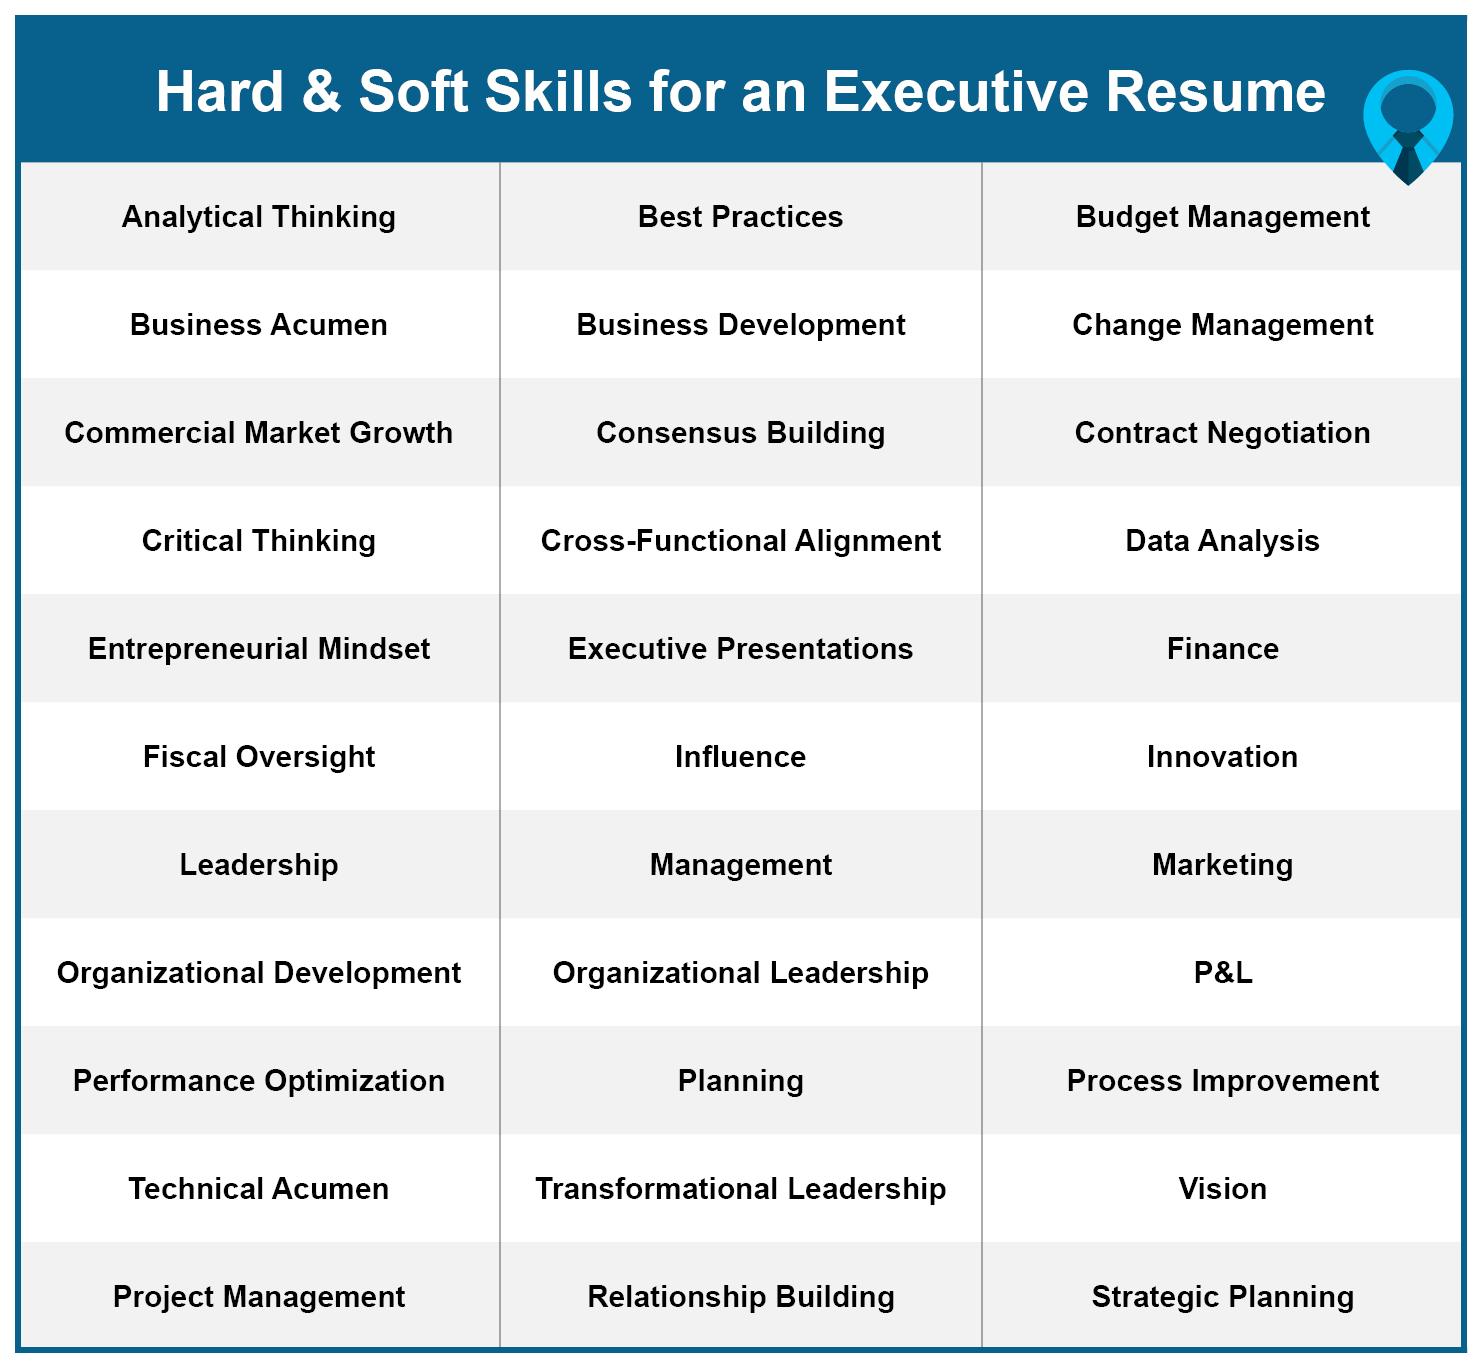 Hard & Soft Skills for an Executive Resume list